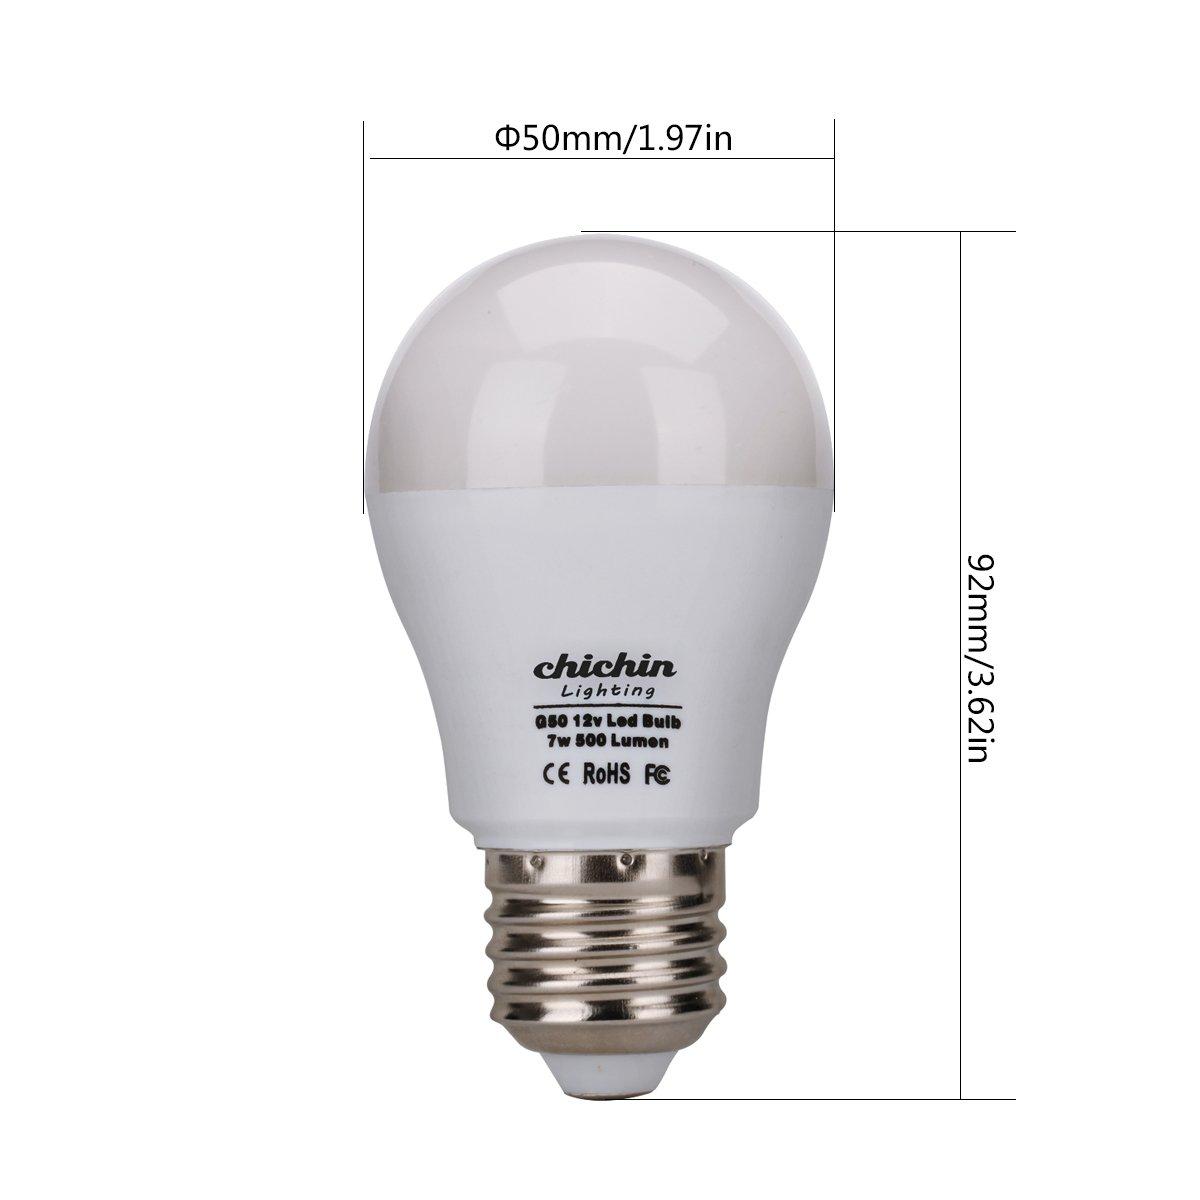 Chichinlighting 12v E26 Led Bulbs 7 Watts 12 Volt Lights Ac Dc Compatible Rv Camper Marine E27 Warm White Canada